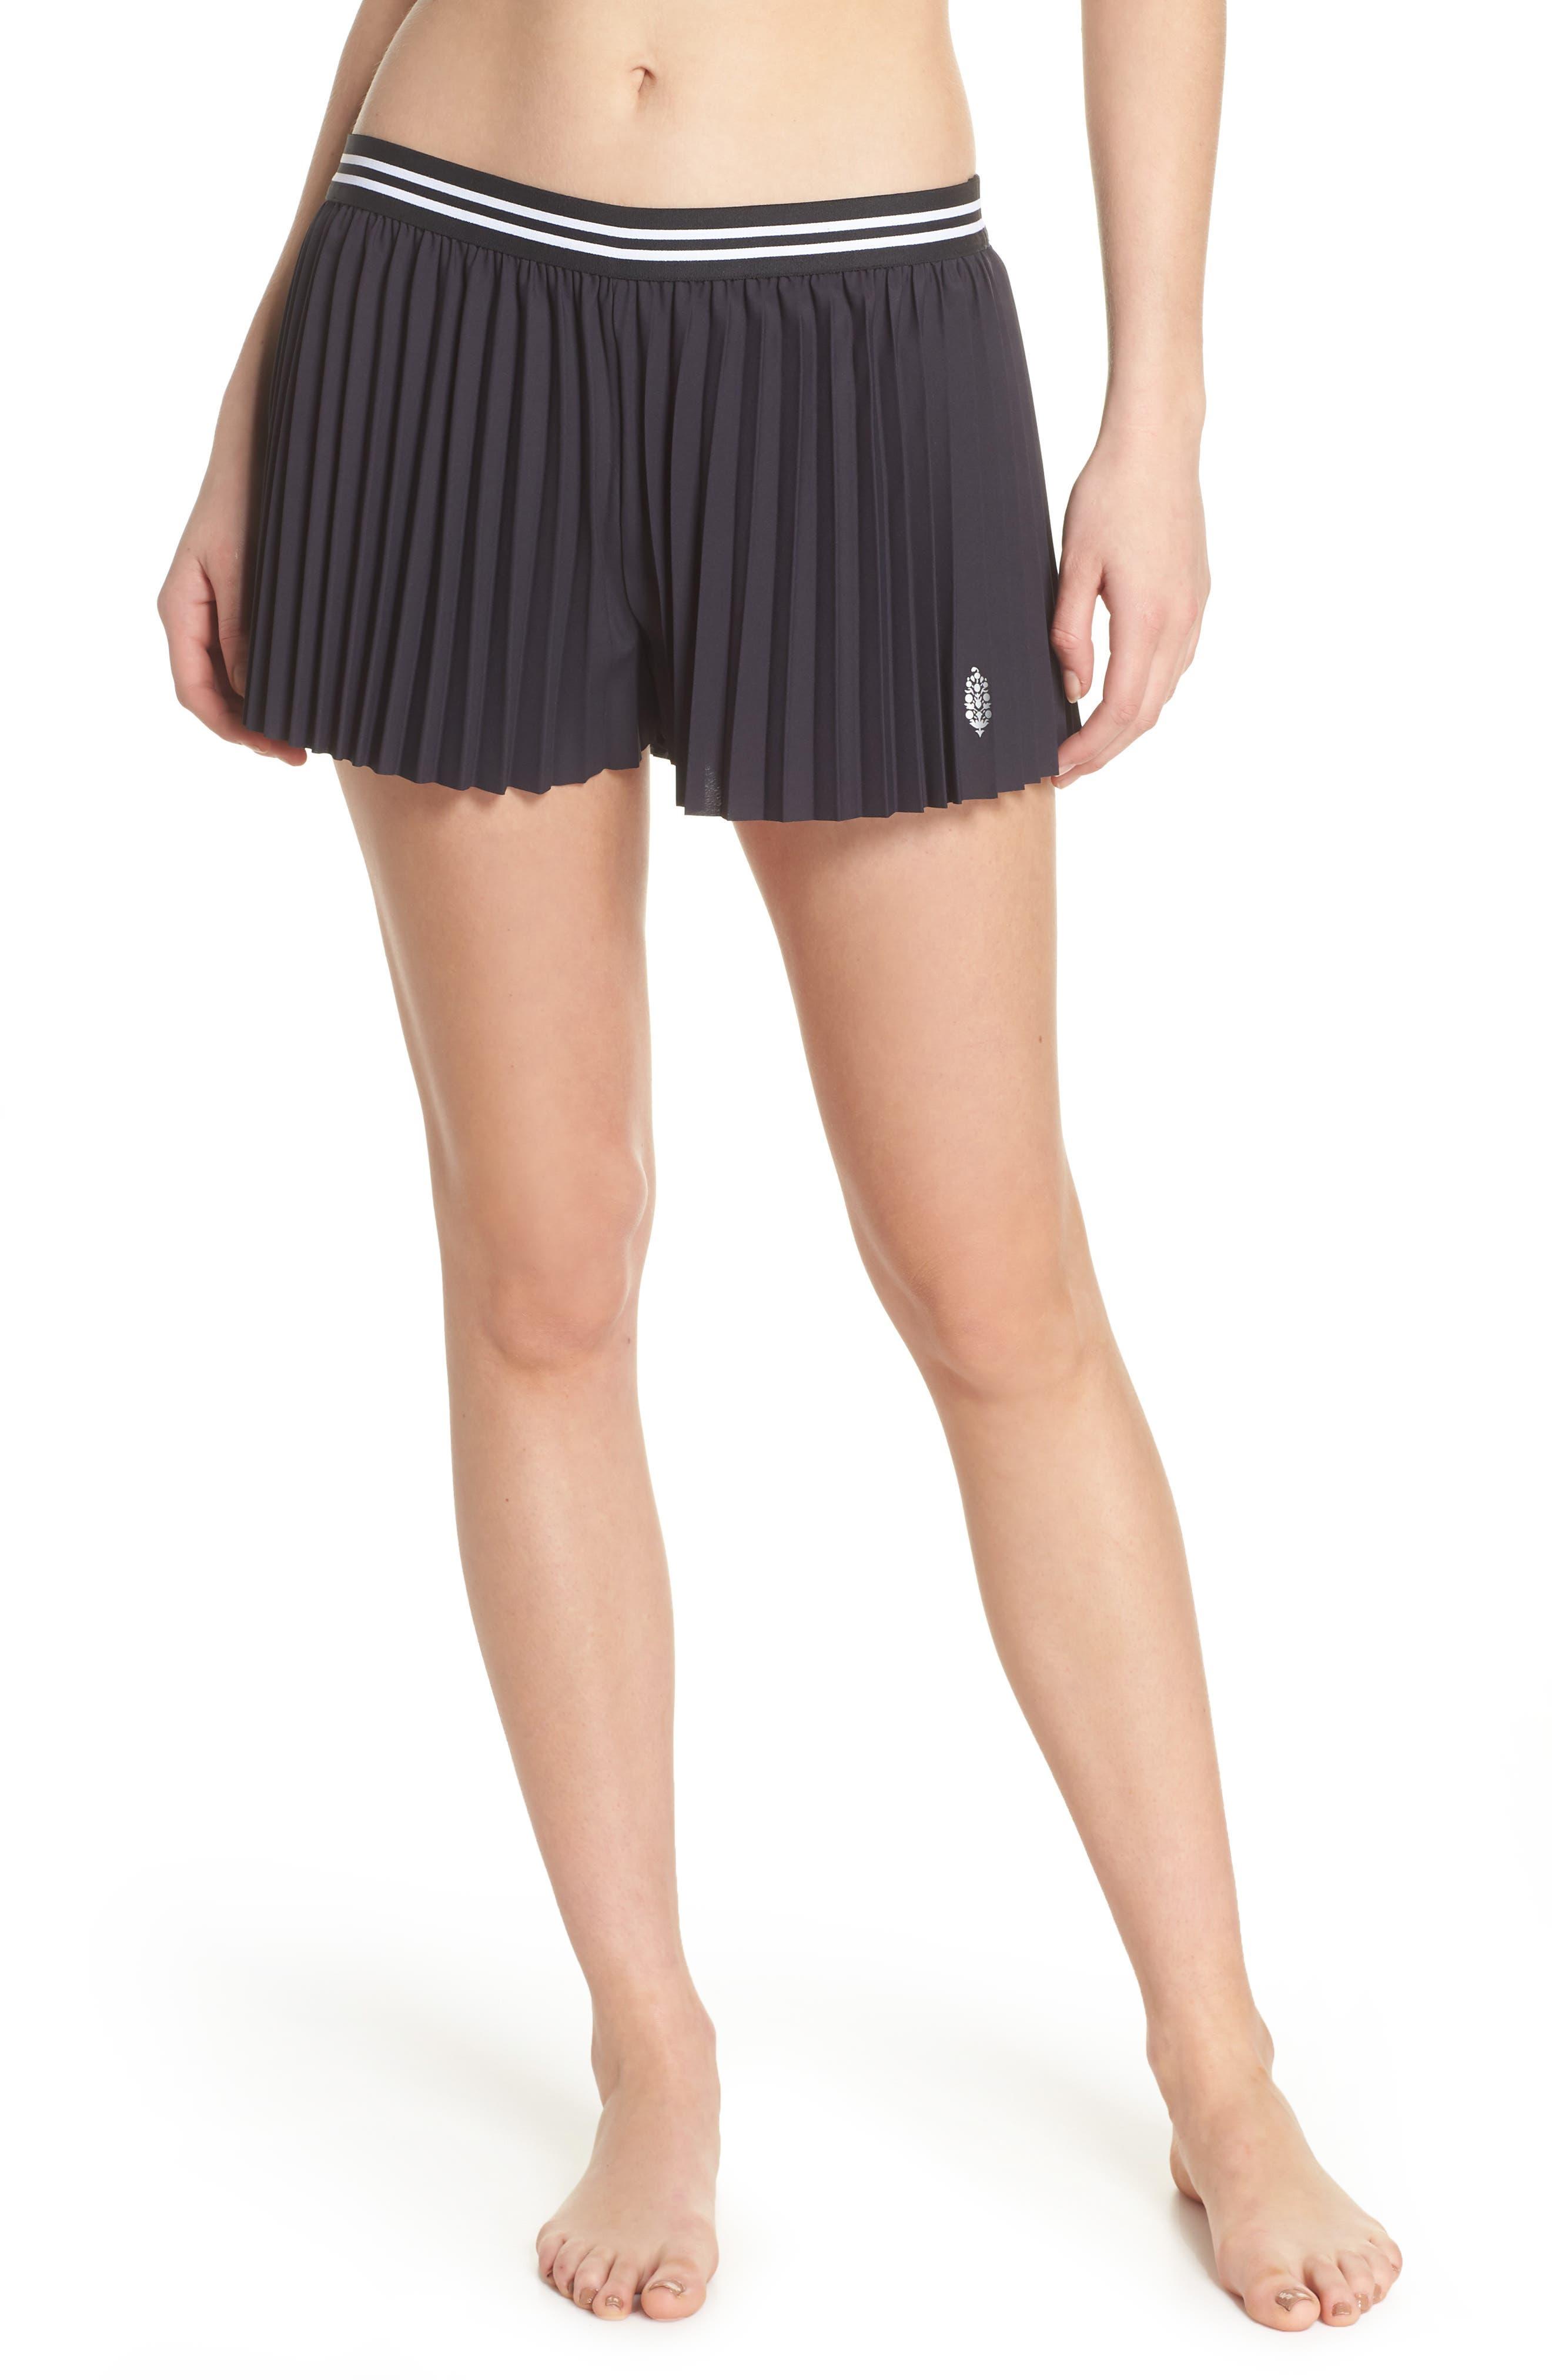 Zephyr Shorts,                         Main,                         color, 001